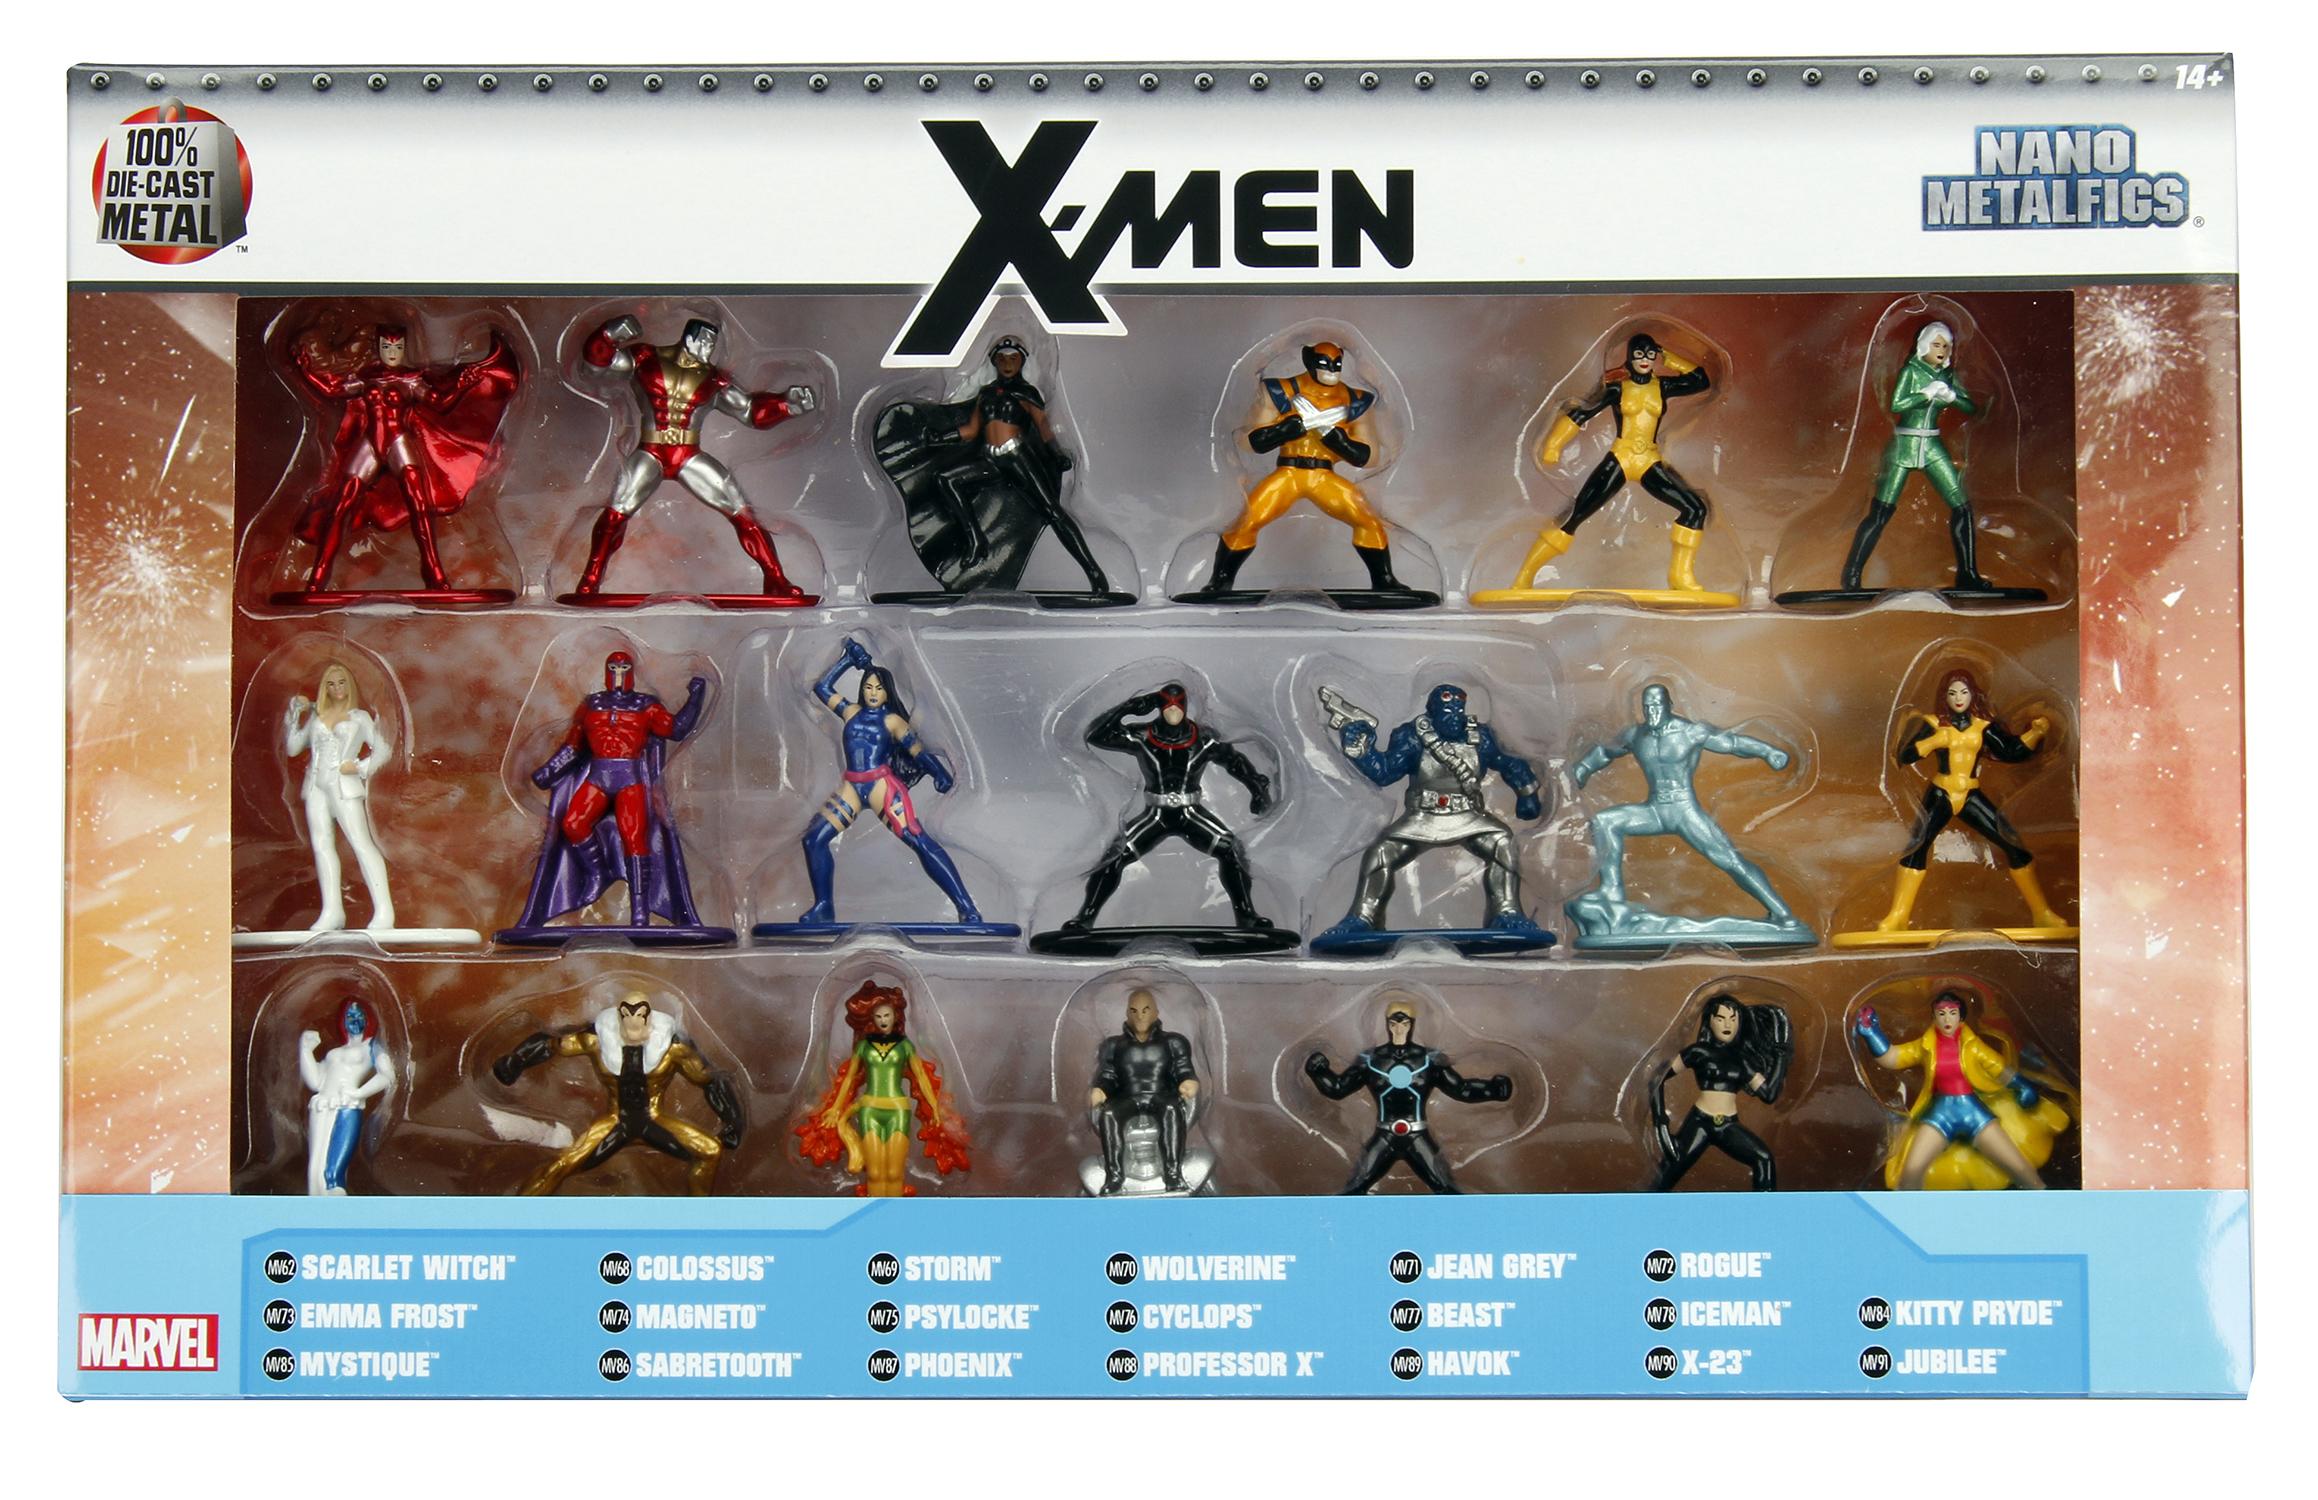 MARVEL HEROES X-MEN METALFIGS NANO 20PC SET